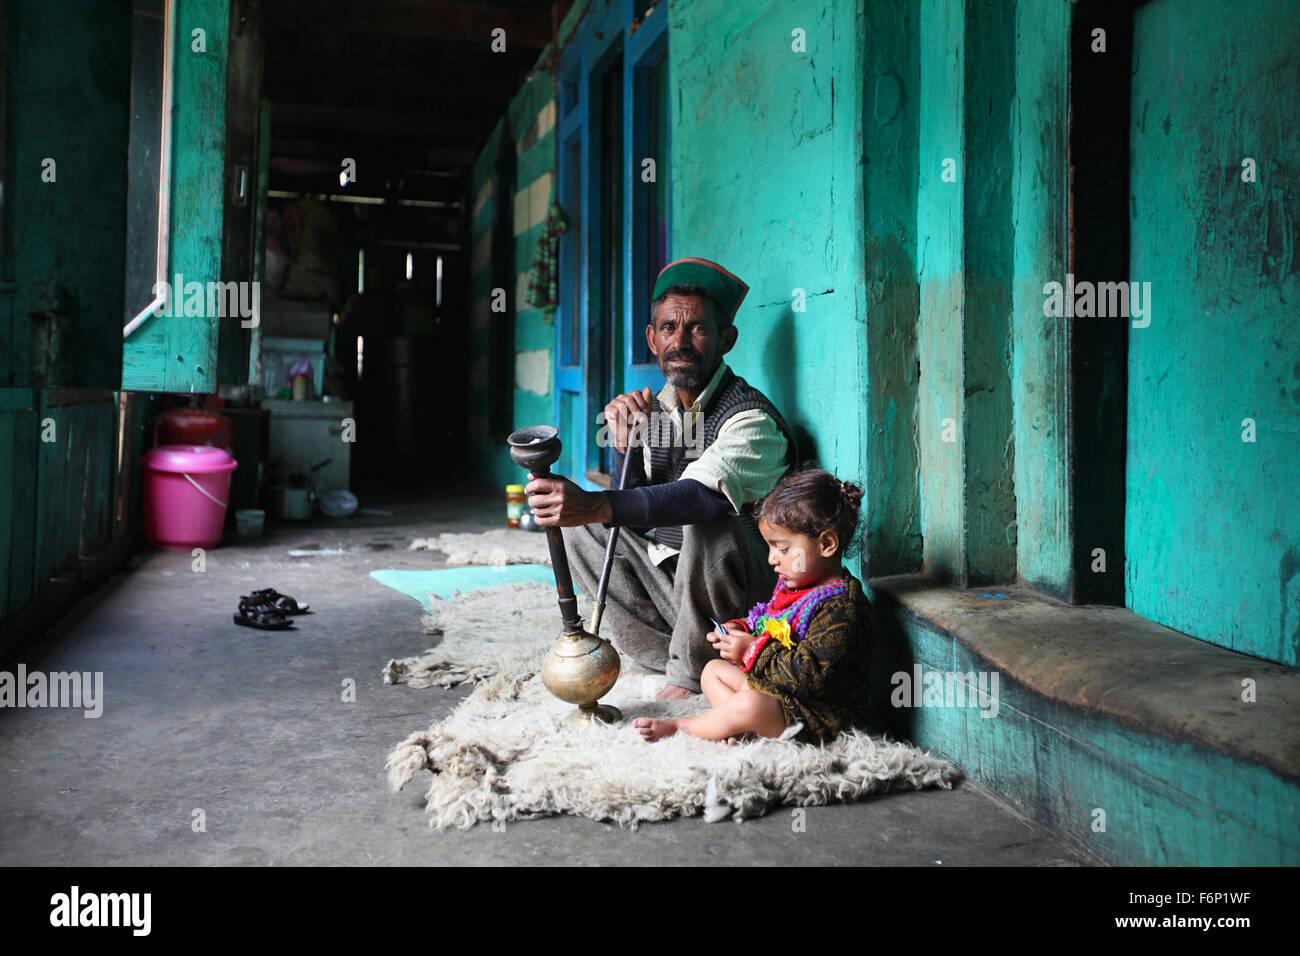 Chitkul Sangla Valley Himachal Pradesh Stock Photos & Chitkul Sangla Valley Himachal Pradesh ...